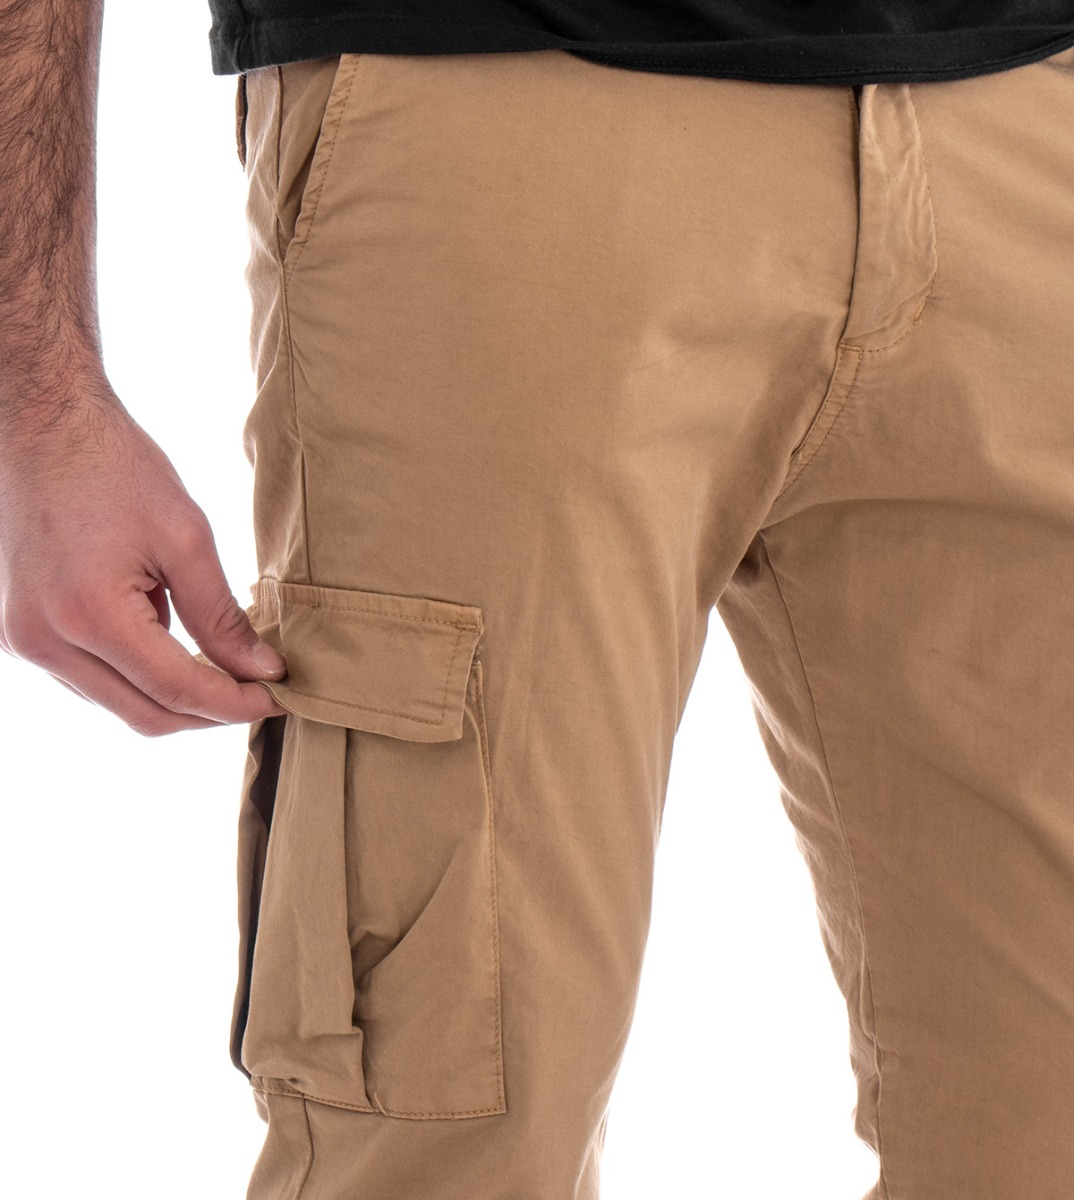 Pantalone-Uomo-Cargo-Tasca-America-Kaki-Tinta-Unita-Cotone-Casual-GIOSAL miniatura 3